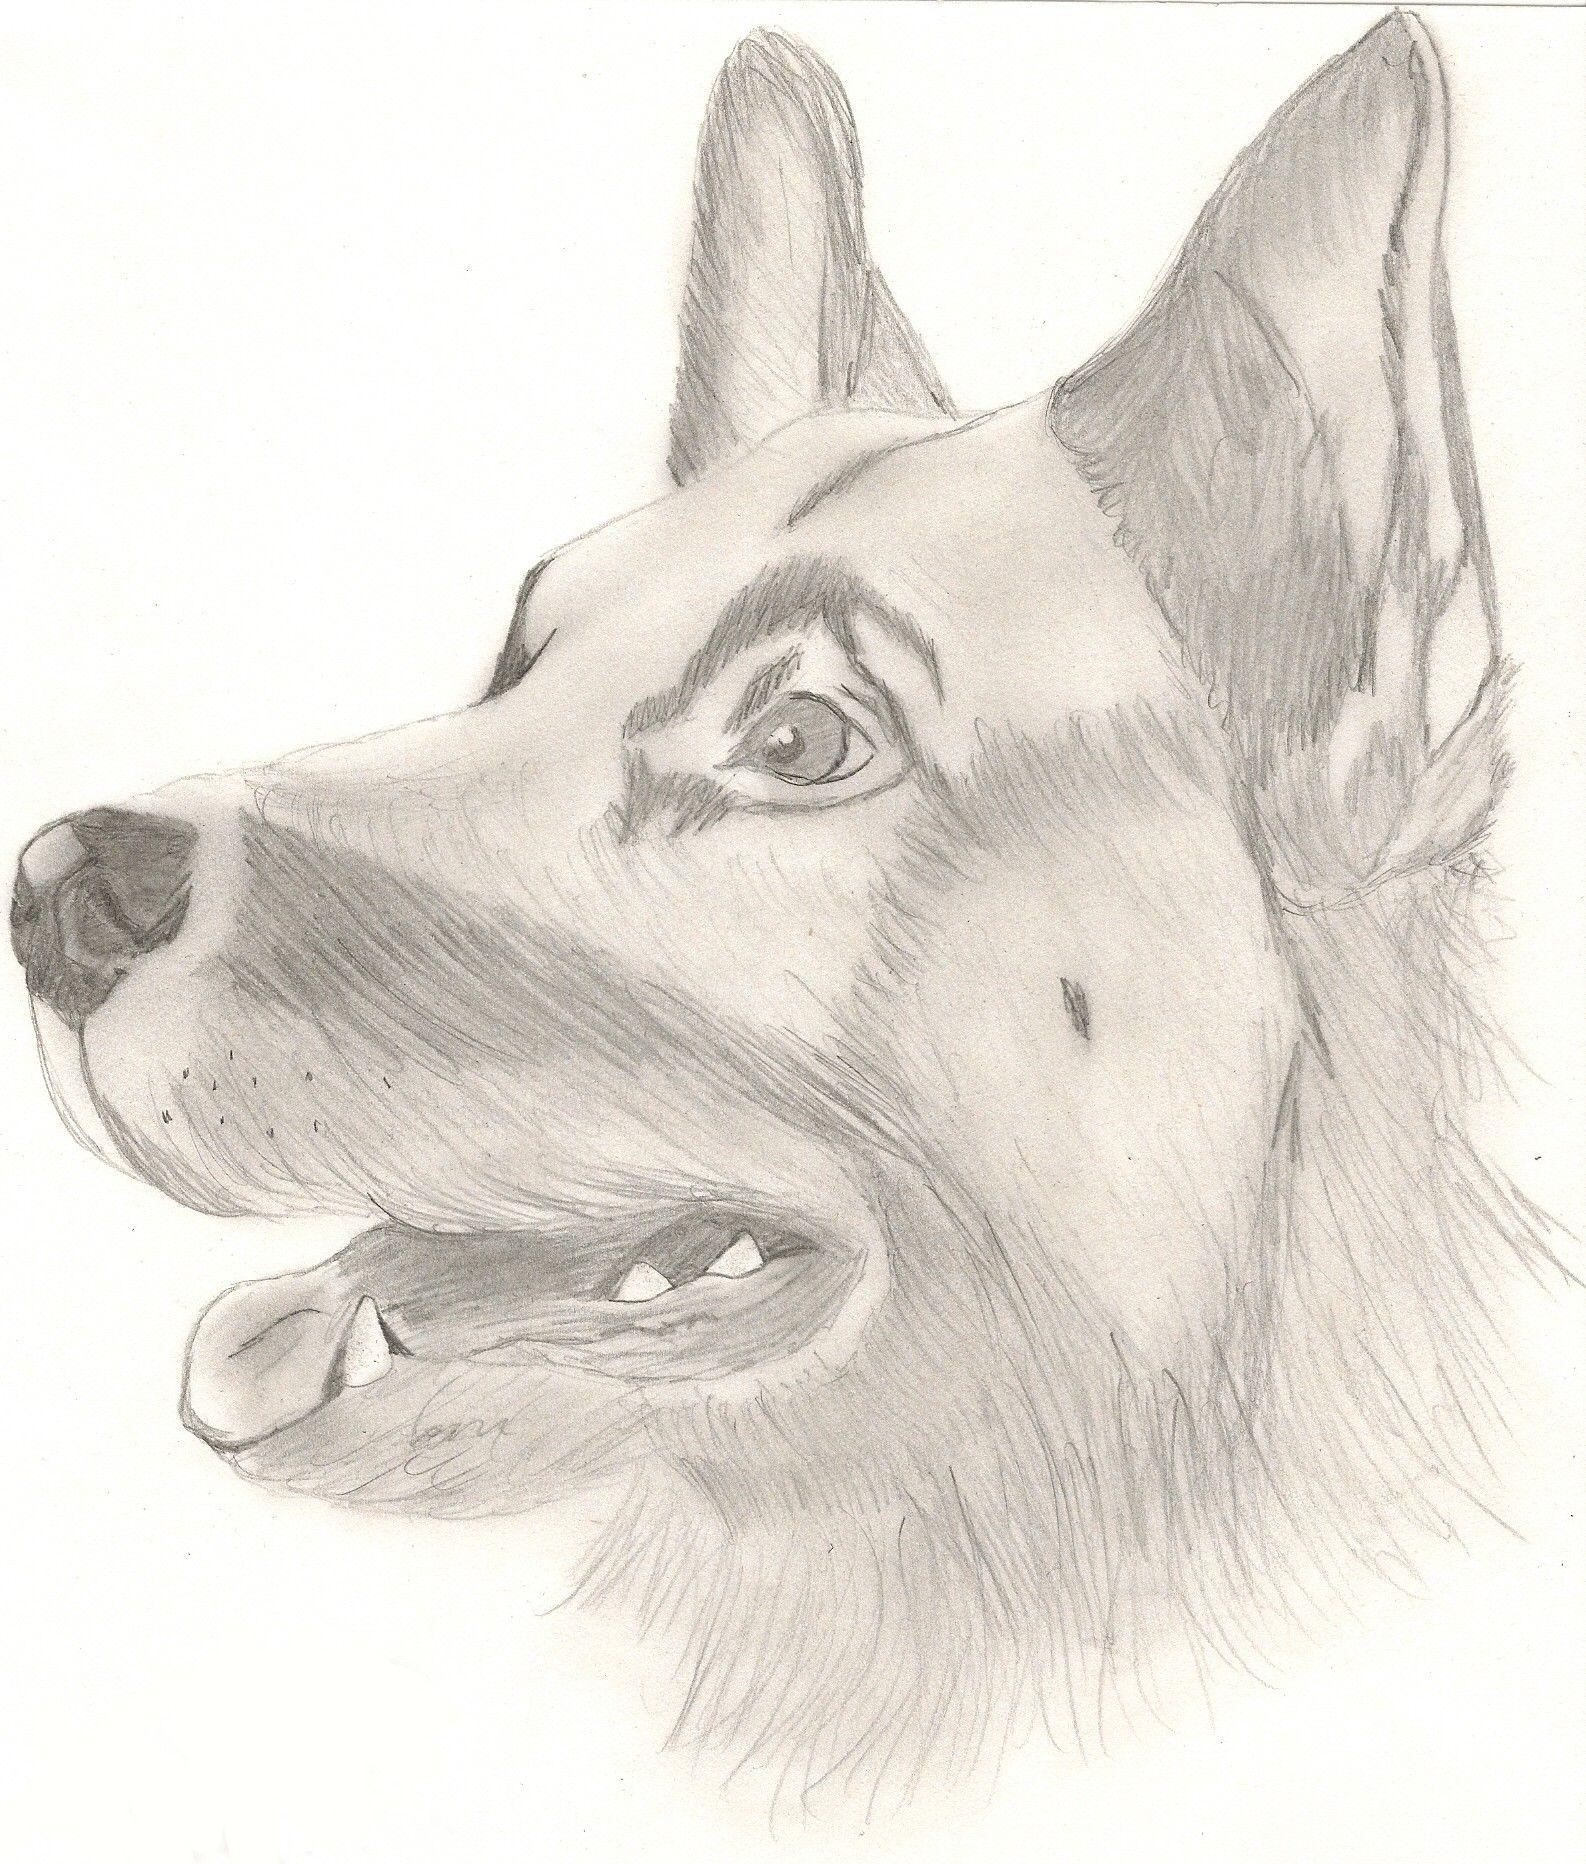 Dessin berger malinois - Dessin de chien berger allemand ...